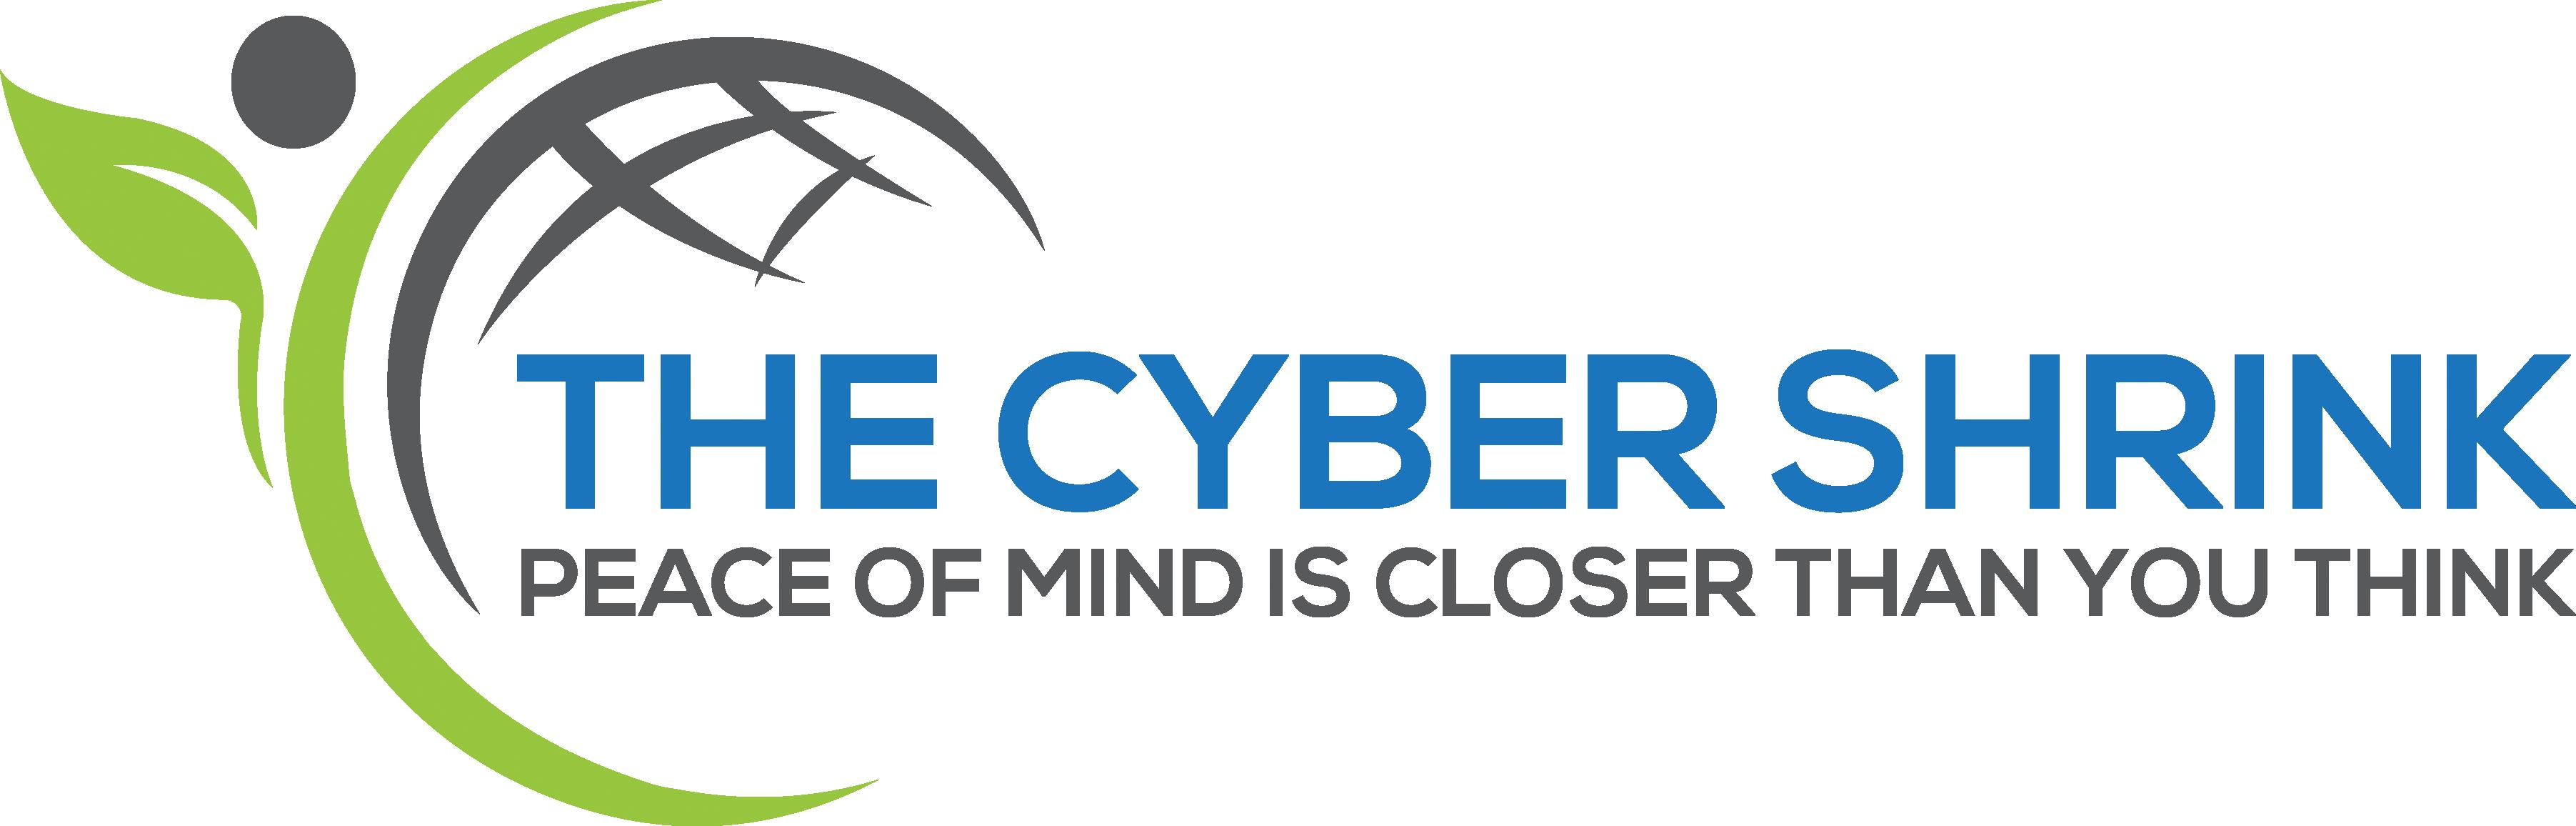 Cyber Shrink Logo